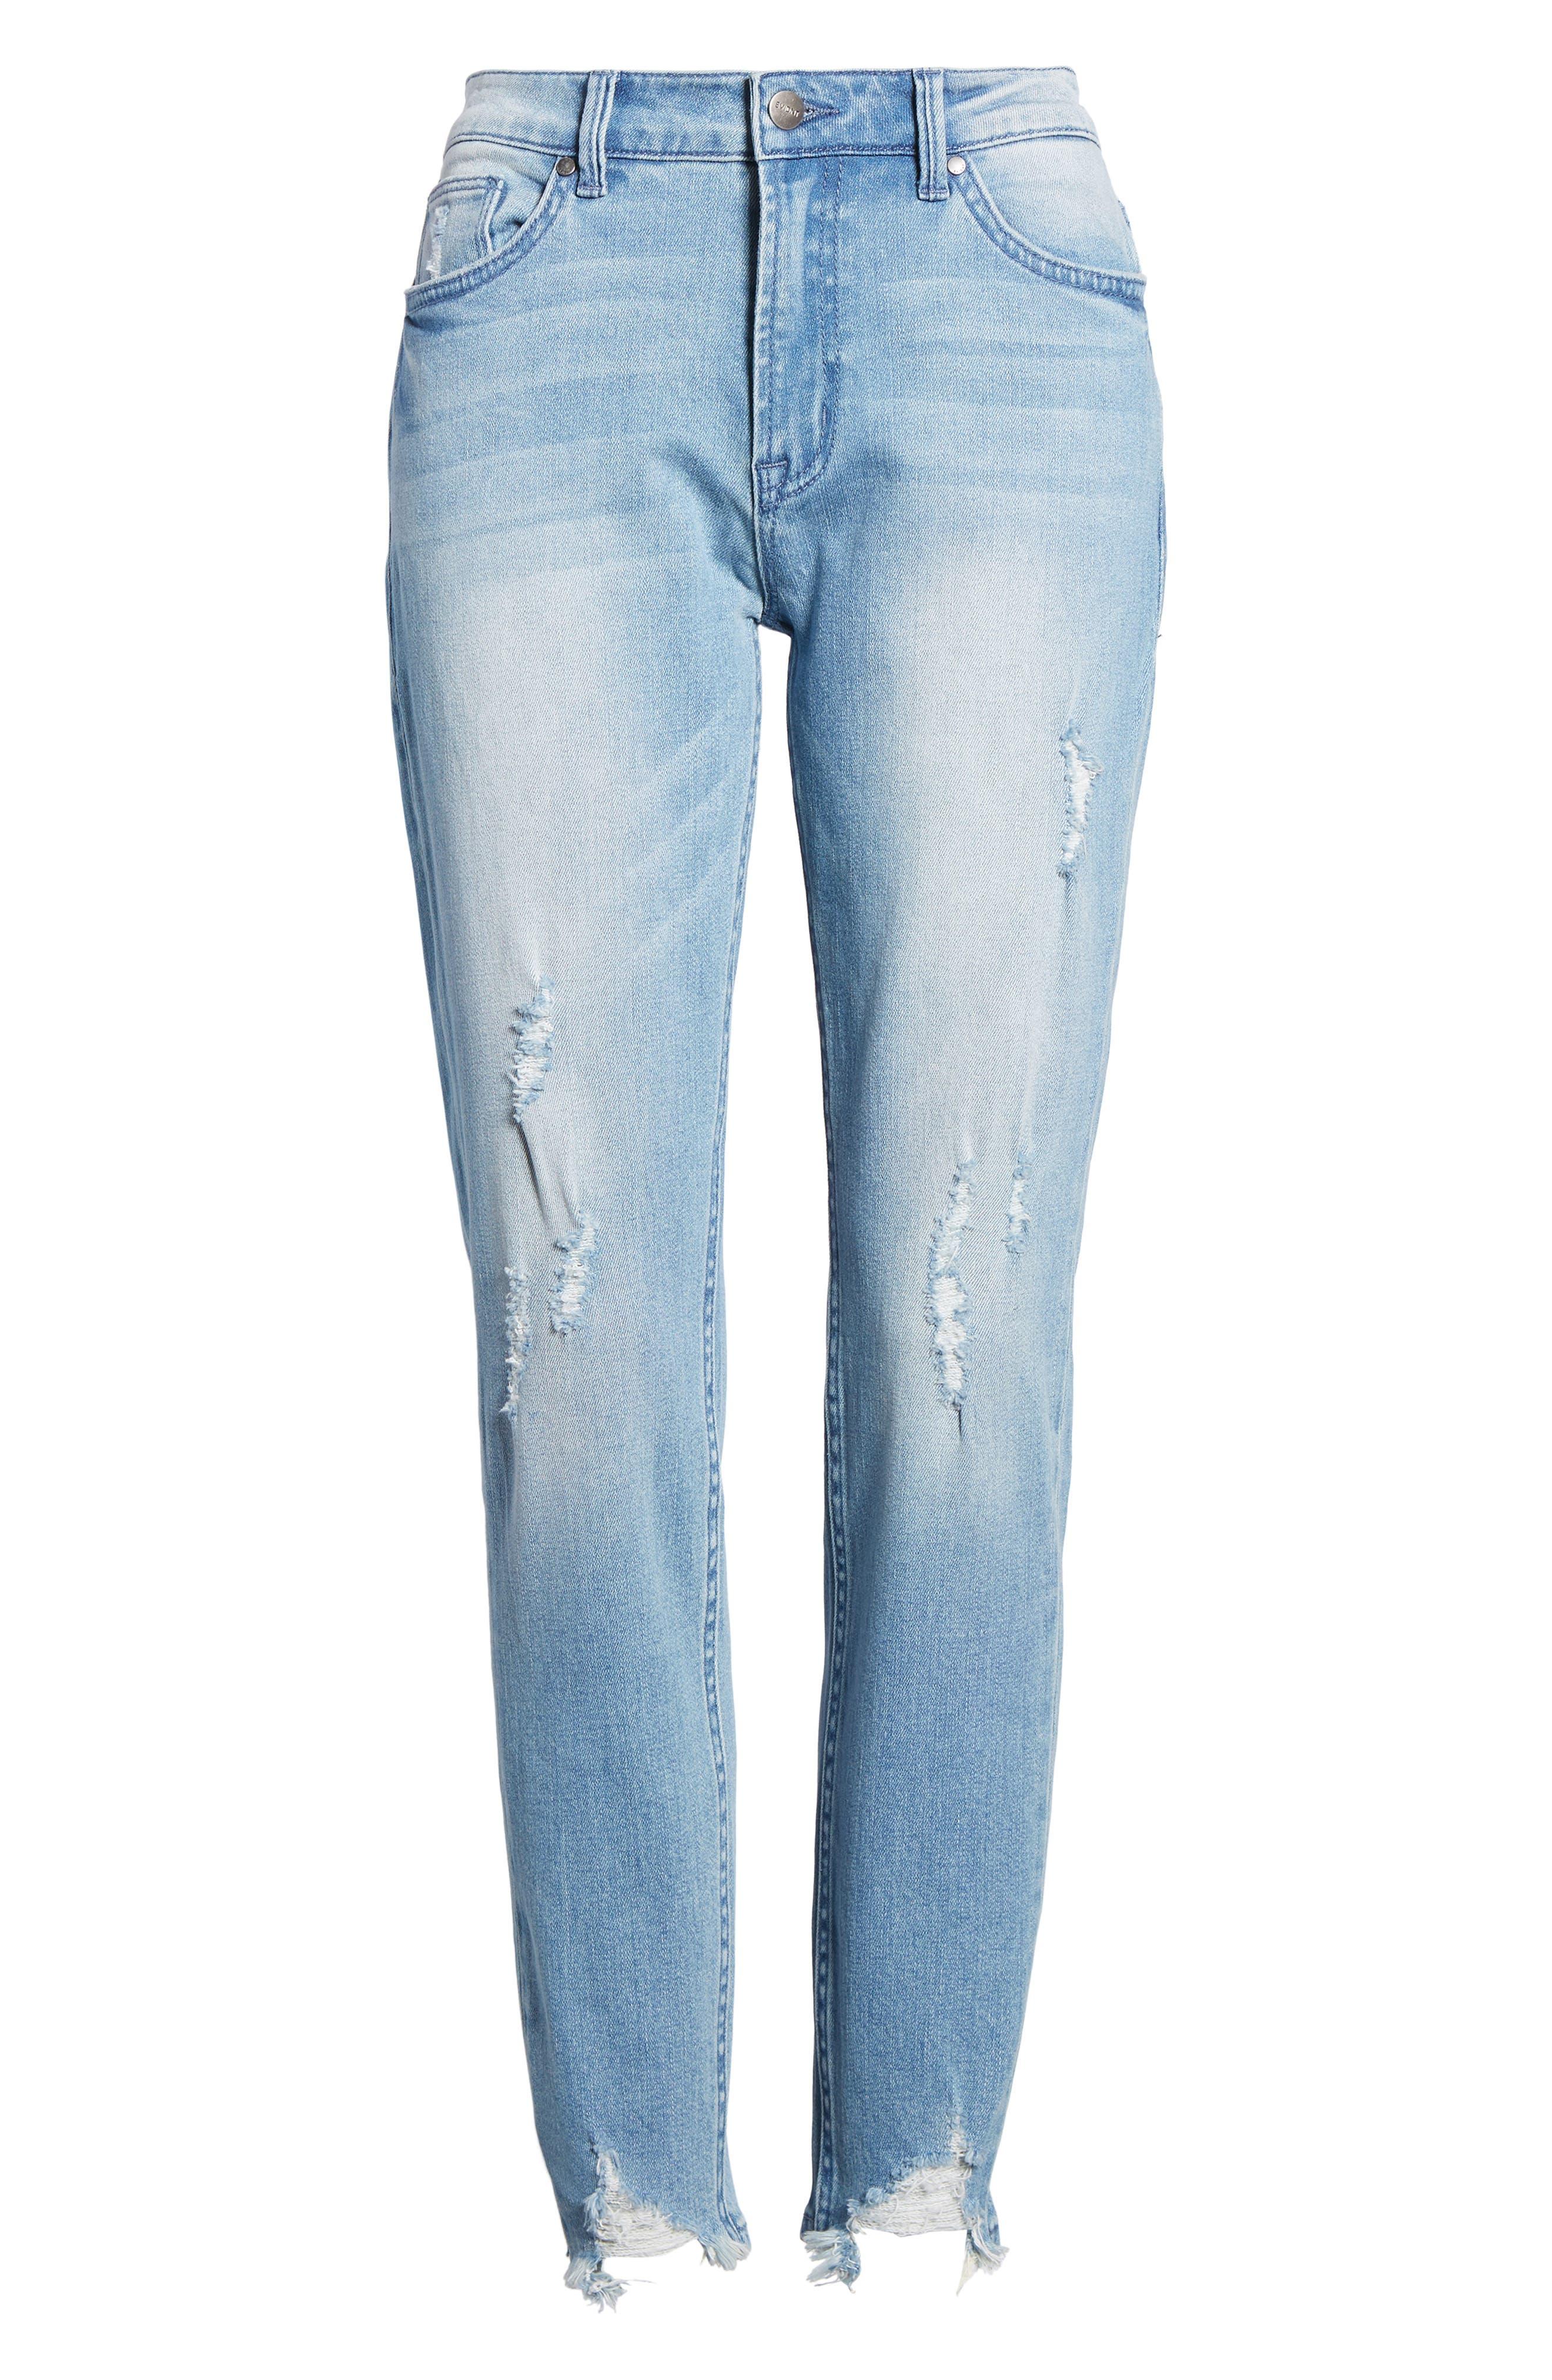 Verona Skinny Jeans,                             Alternate thumbnail 7, color,